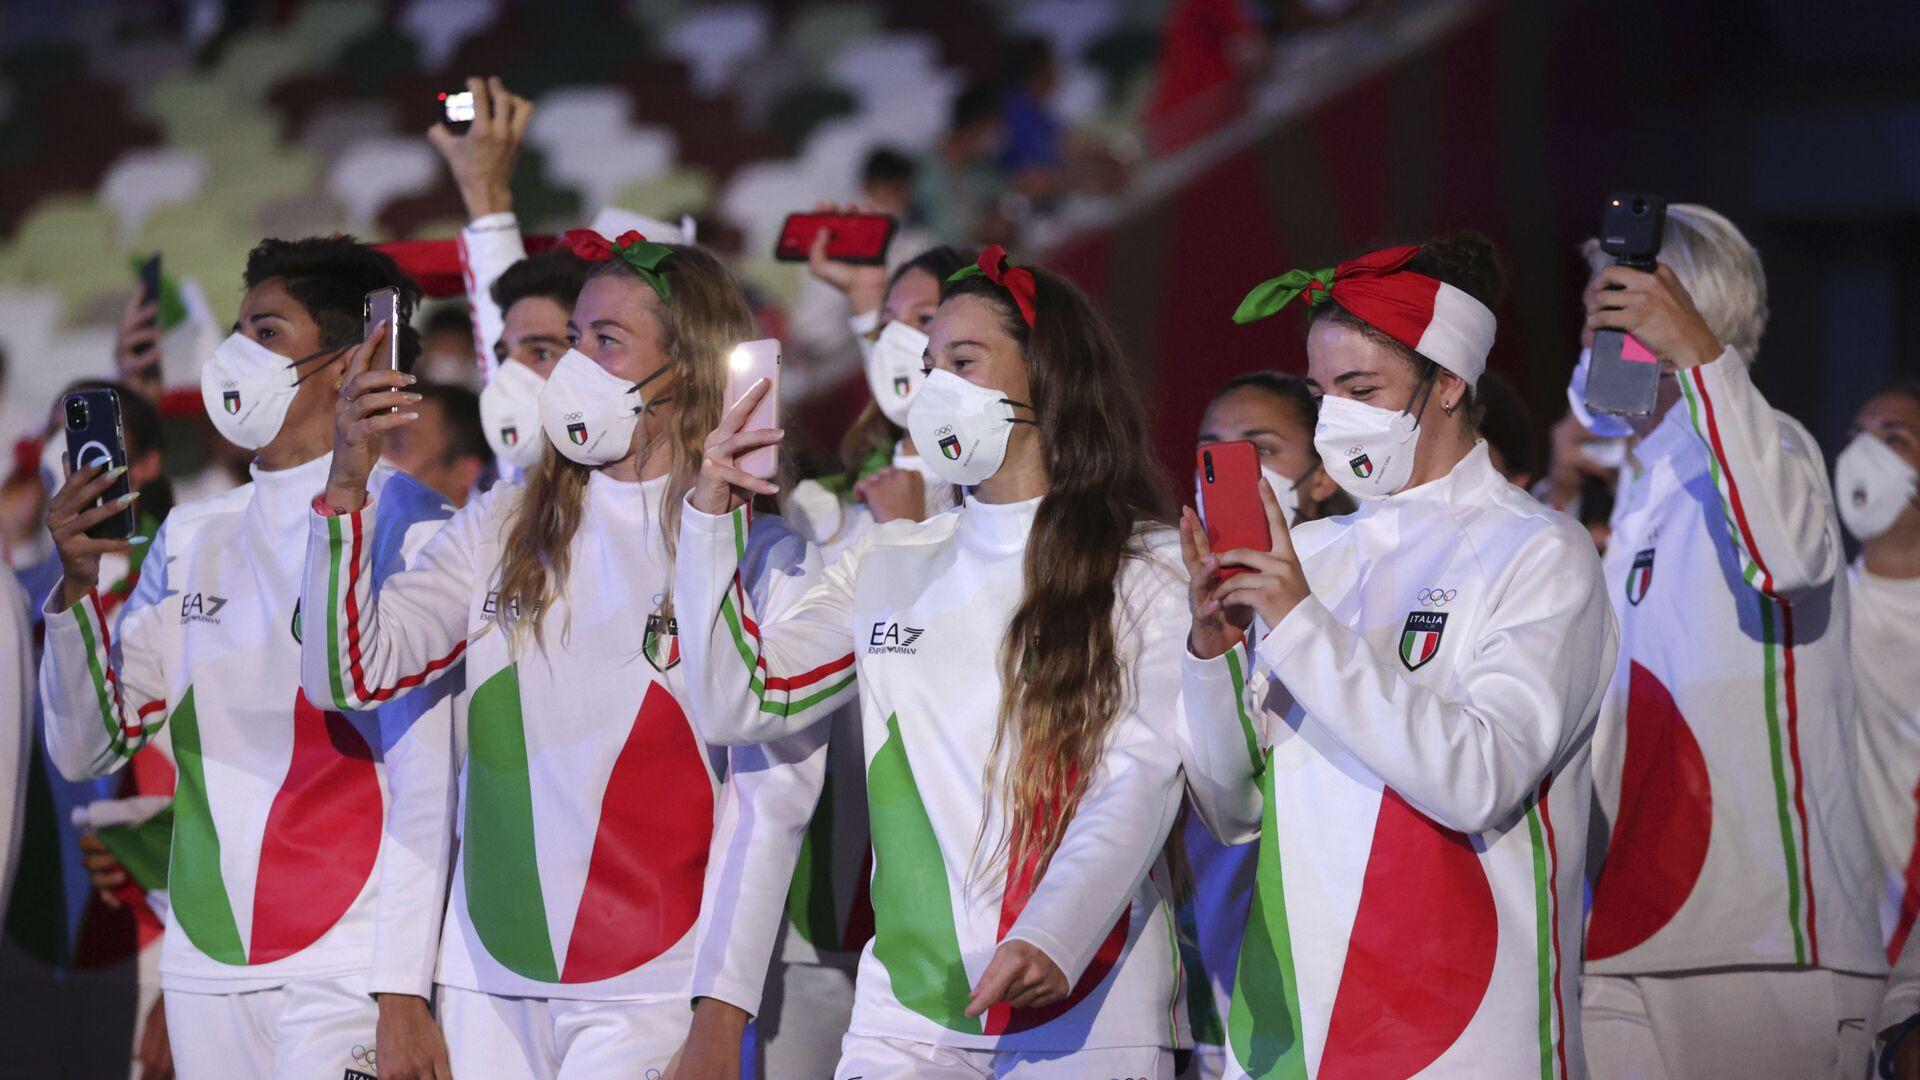 Tokyo 2020, la nazionale italiana - Sputnik Italia, 1920, 04.08.2021